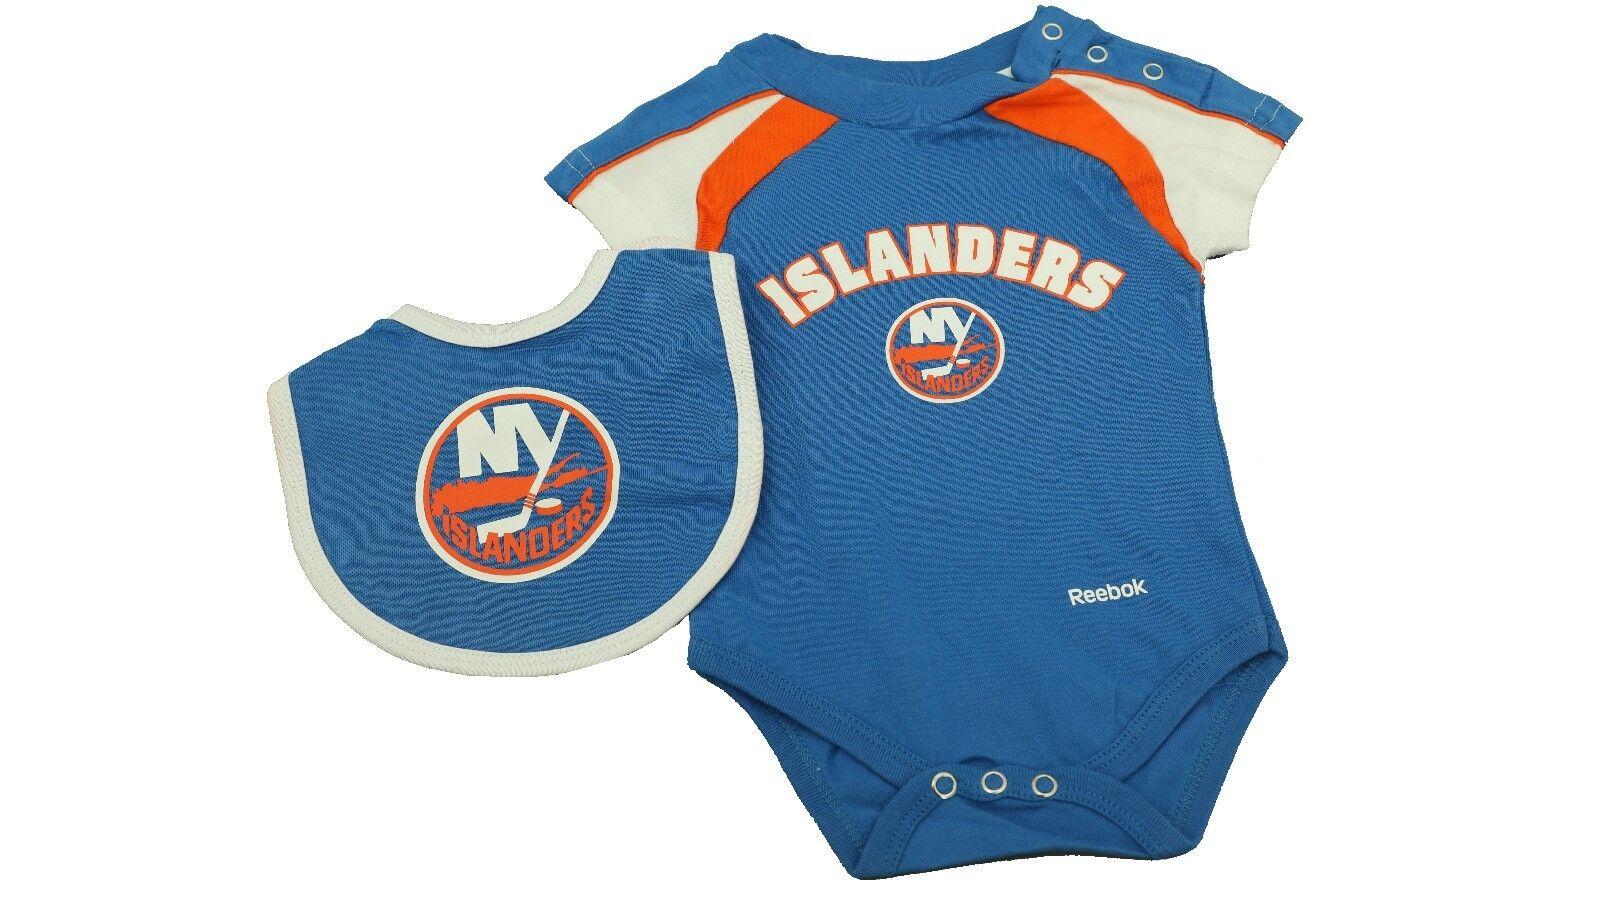 new product c2df2 f4c57 Details about NHL New York Islanders Genuine Reebok Infant 3 Piece Creeper  Set Bib & Boots New